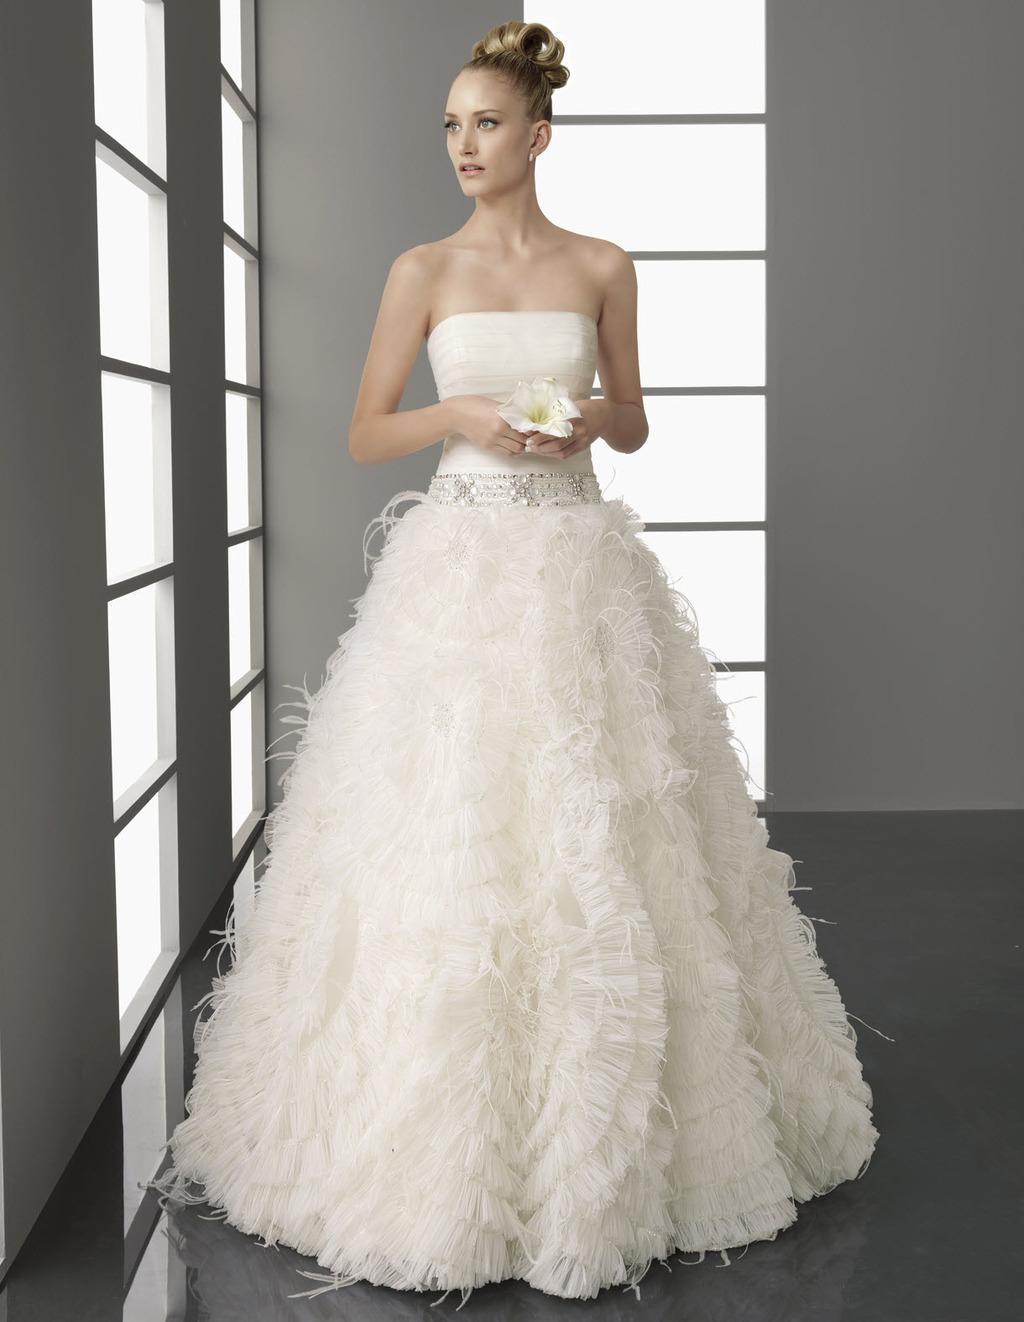 Papiro-glamourous-wedding-dress-spring-2012-aire-barcelona-beaded-bridal-belt.full